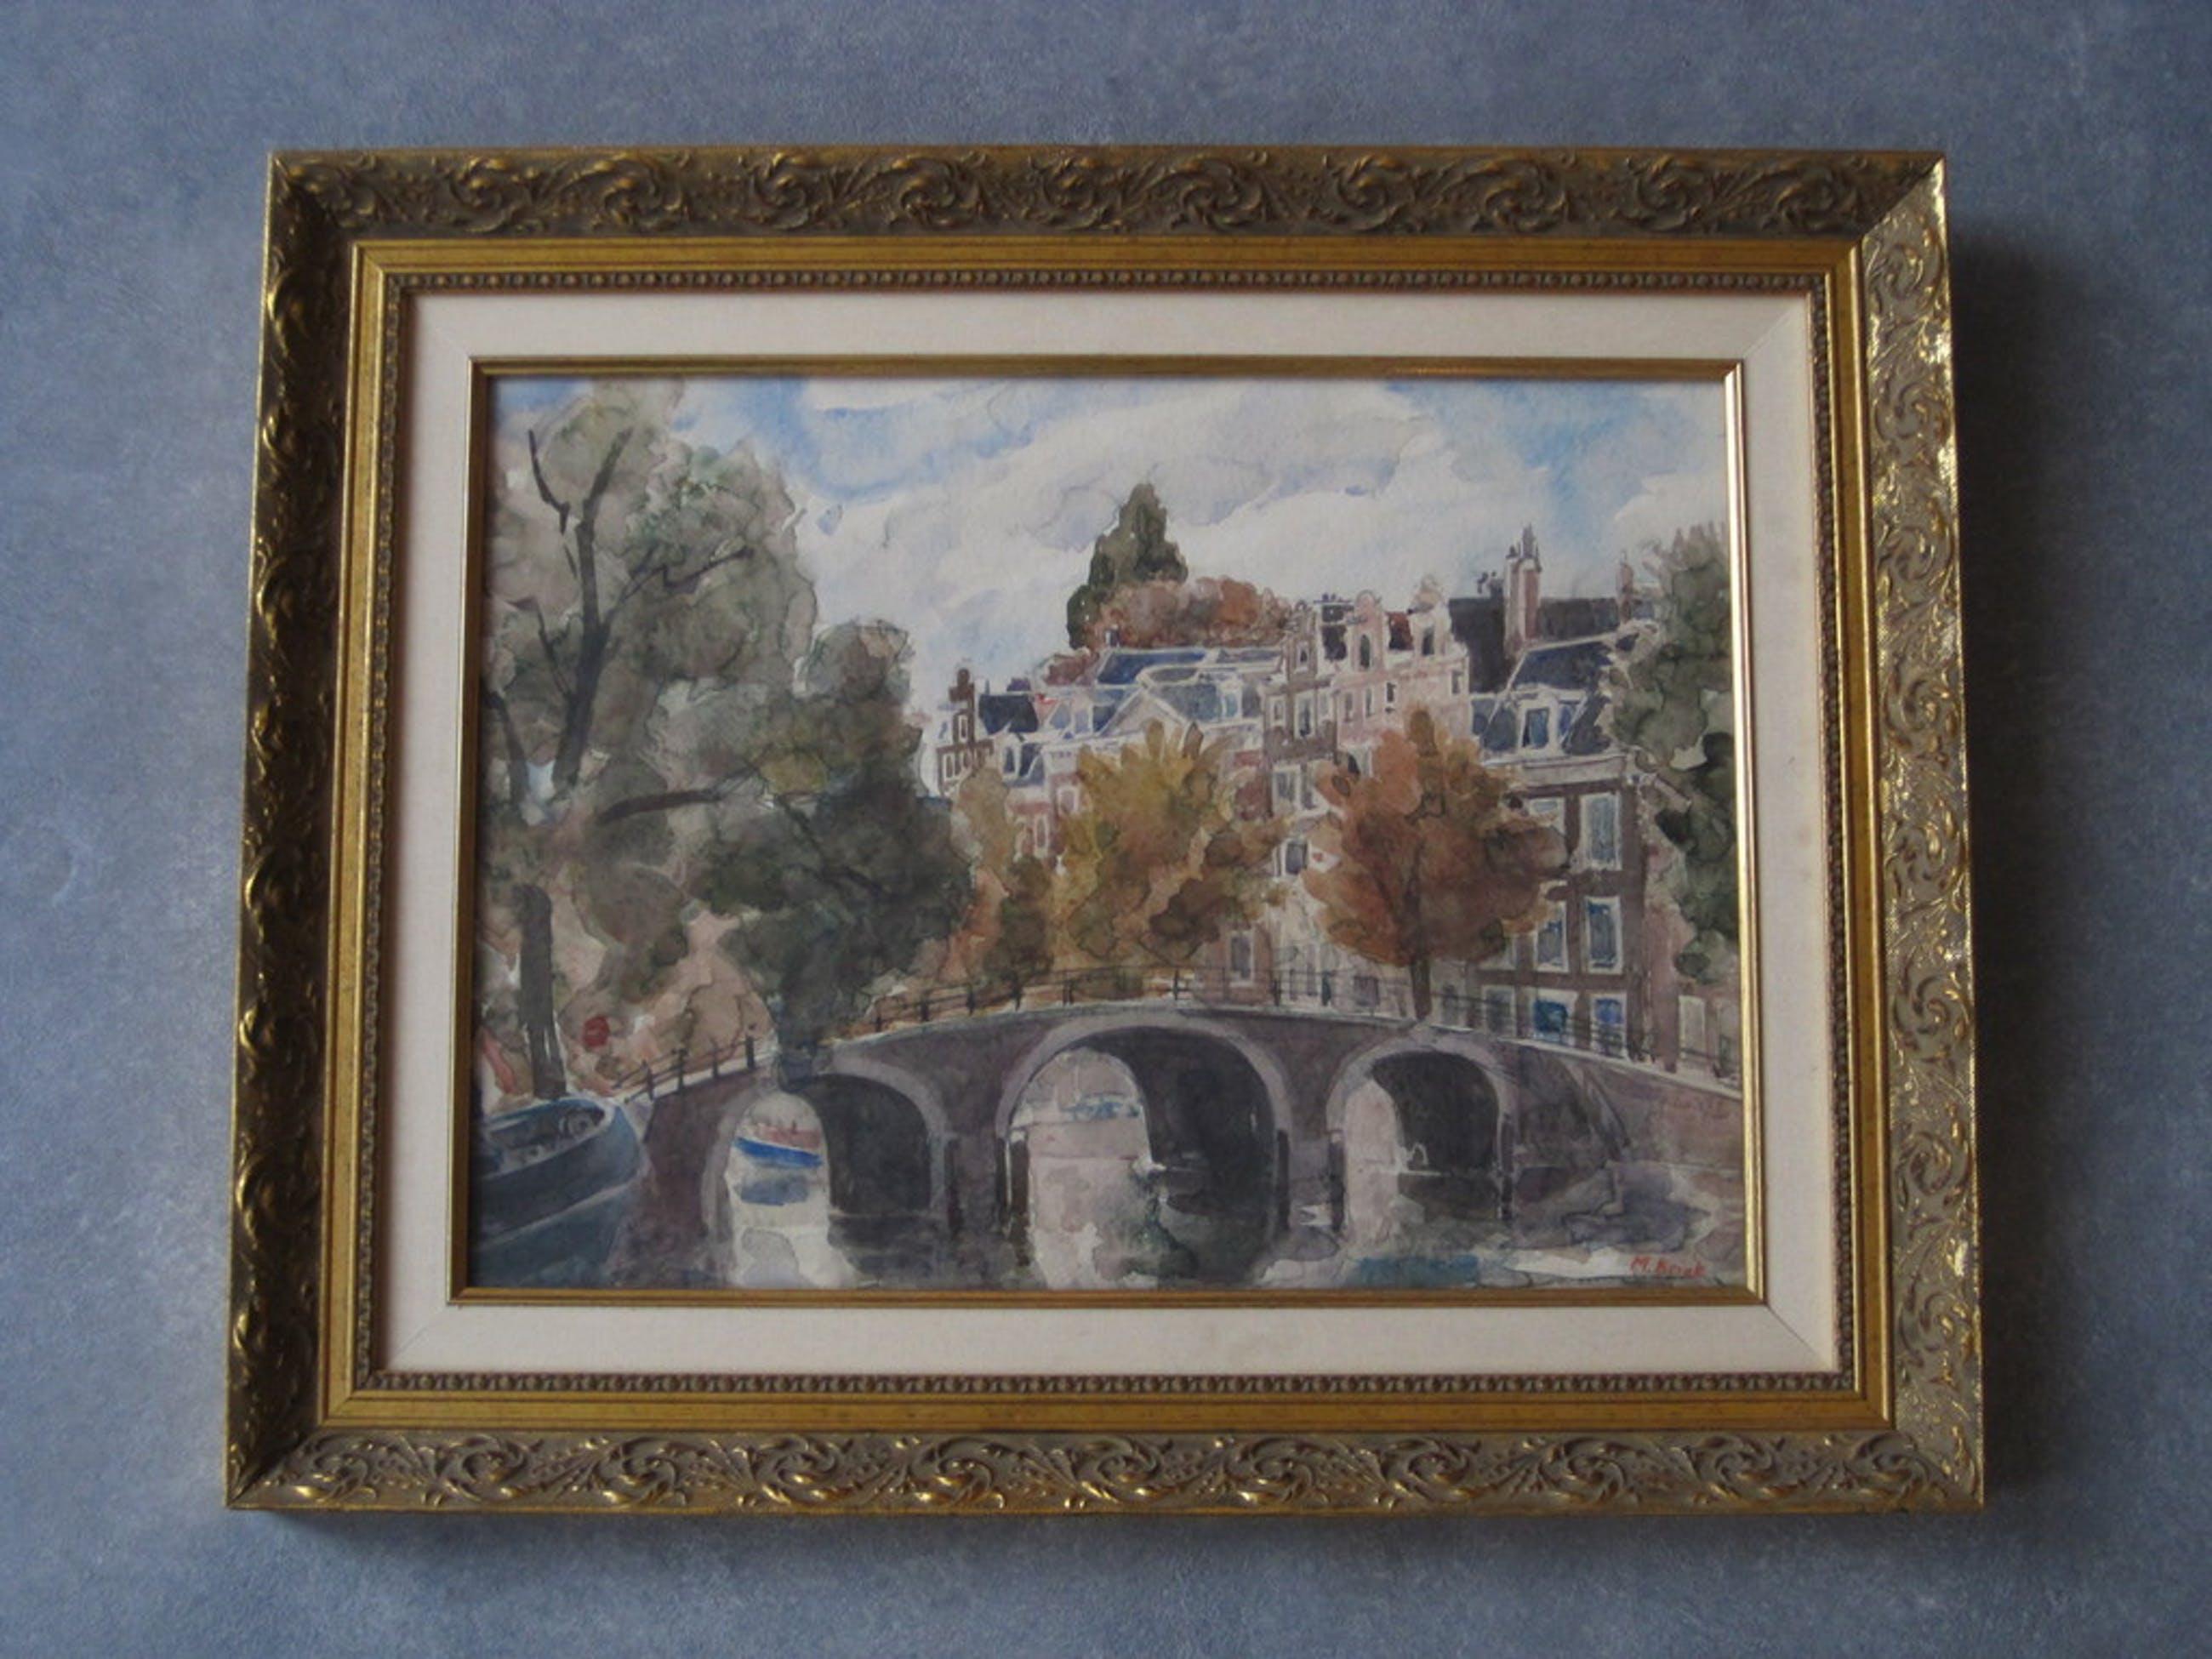 Mario Kriek 1906-1977 aquarel, Amsterdam Herengracht kopen? Bied vanaf 10!